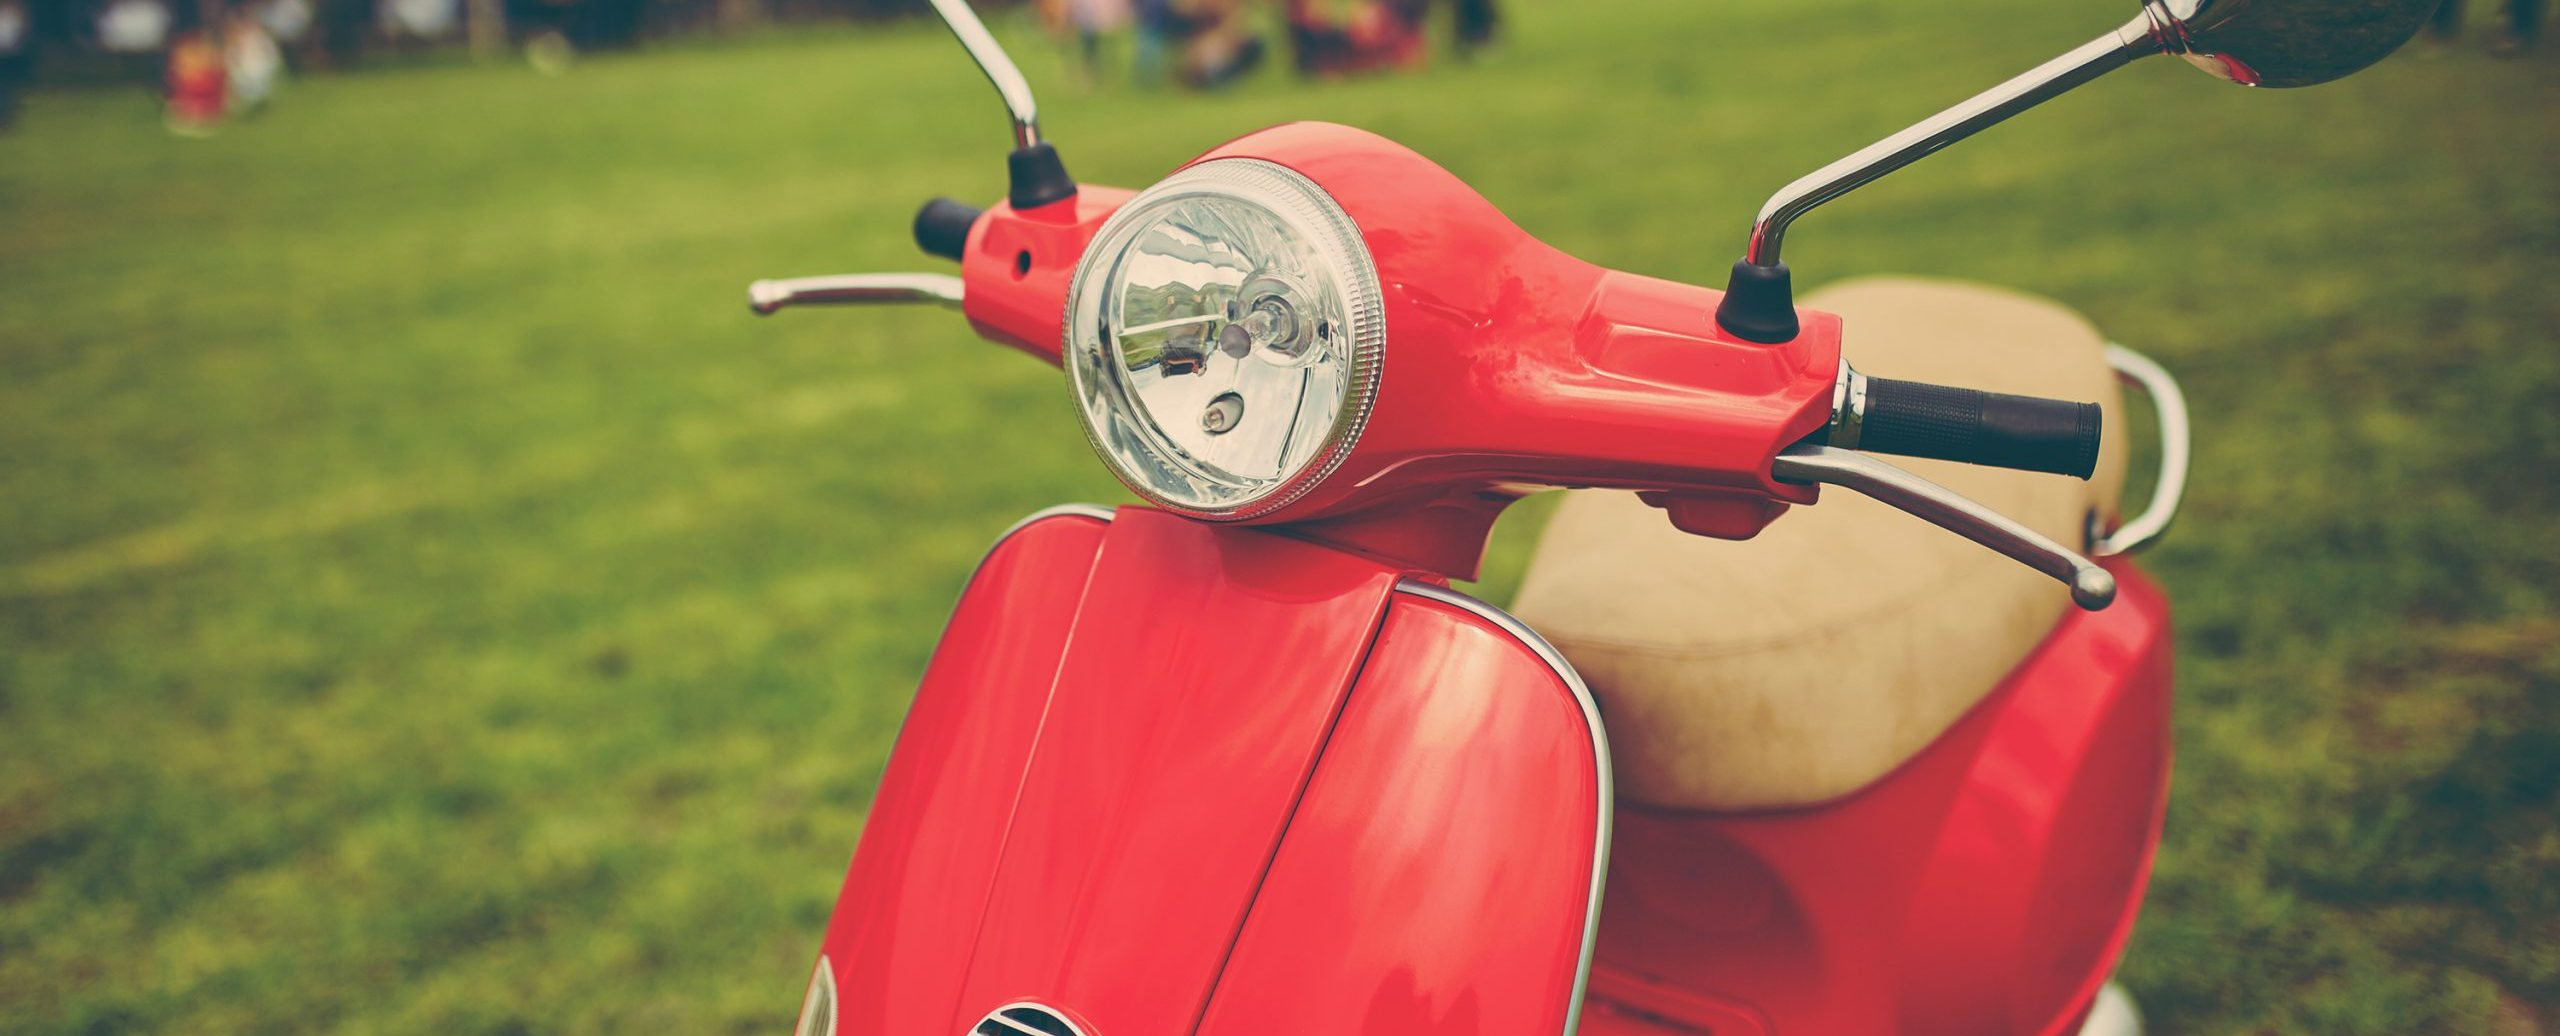 Assegurances de Ciclomotor